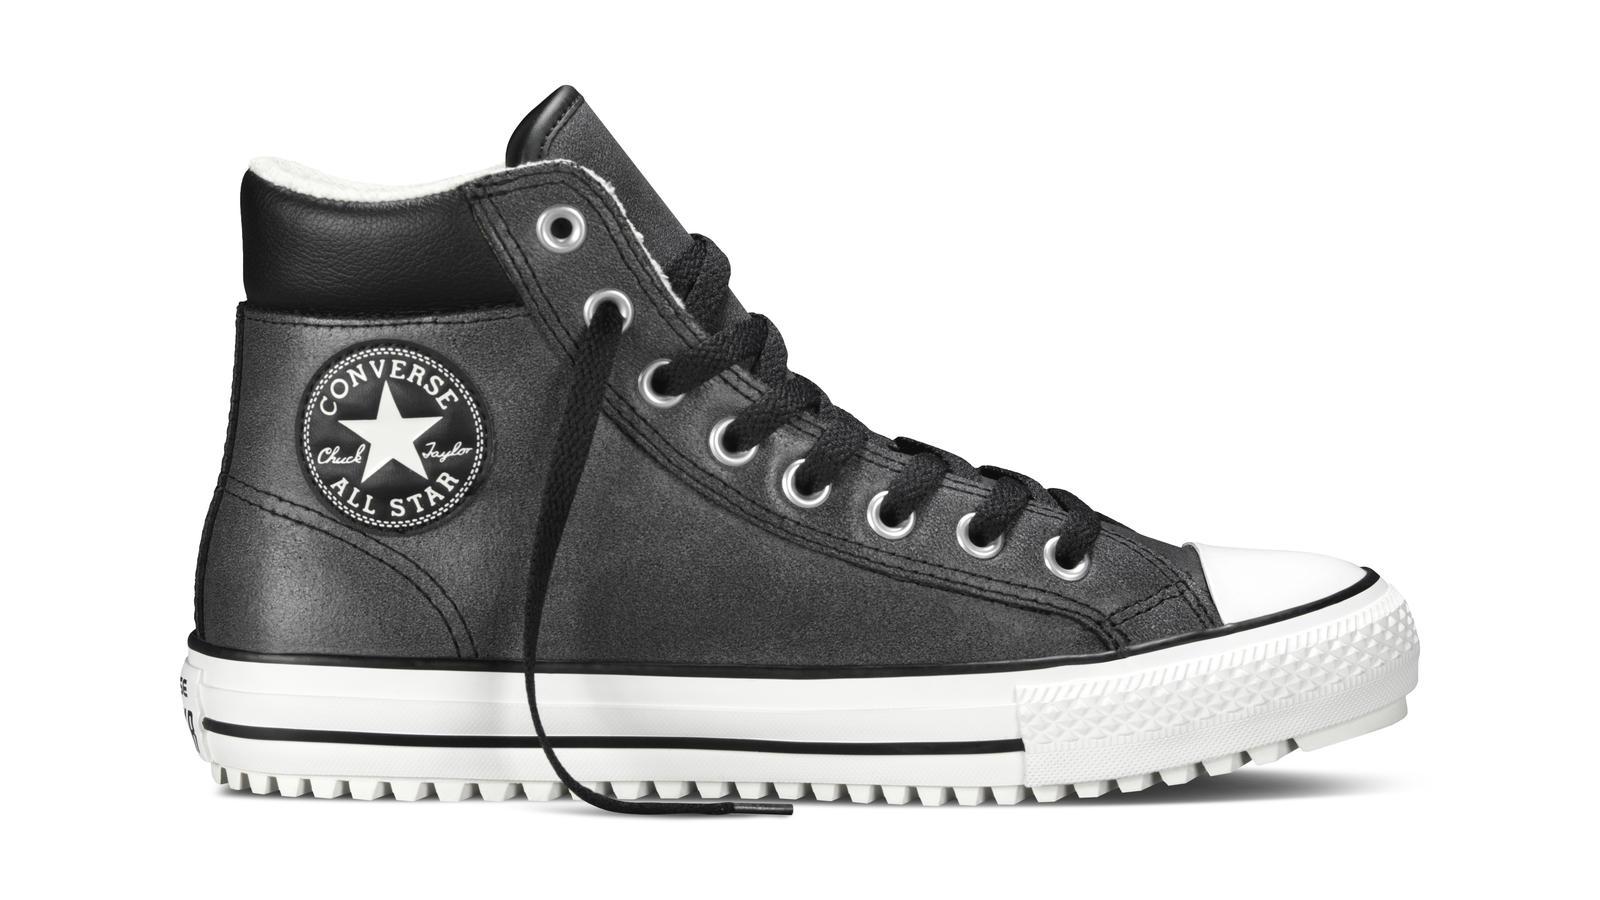 fa685bf2ae5 Converse Chuck Taylor All Star Boot PC - Nike News